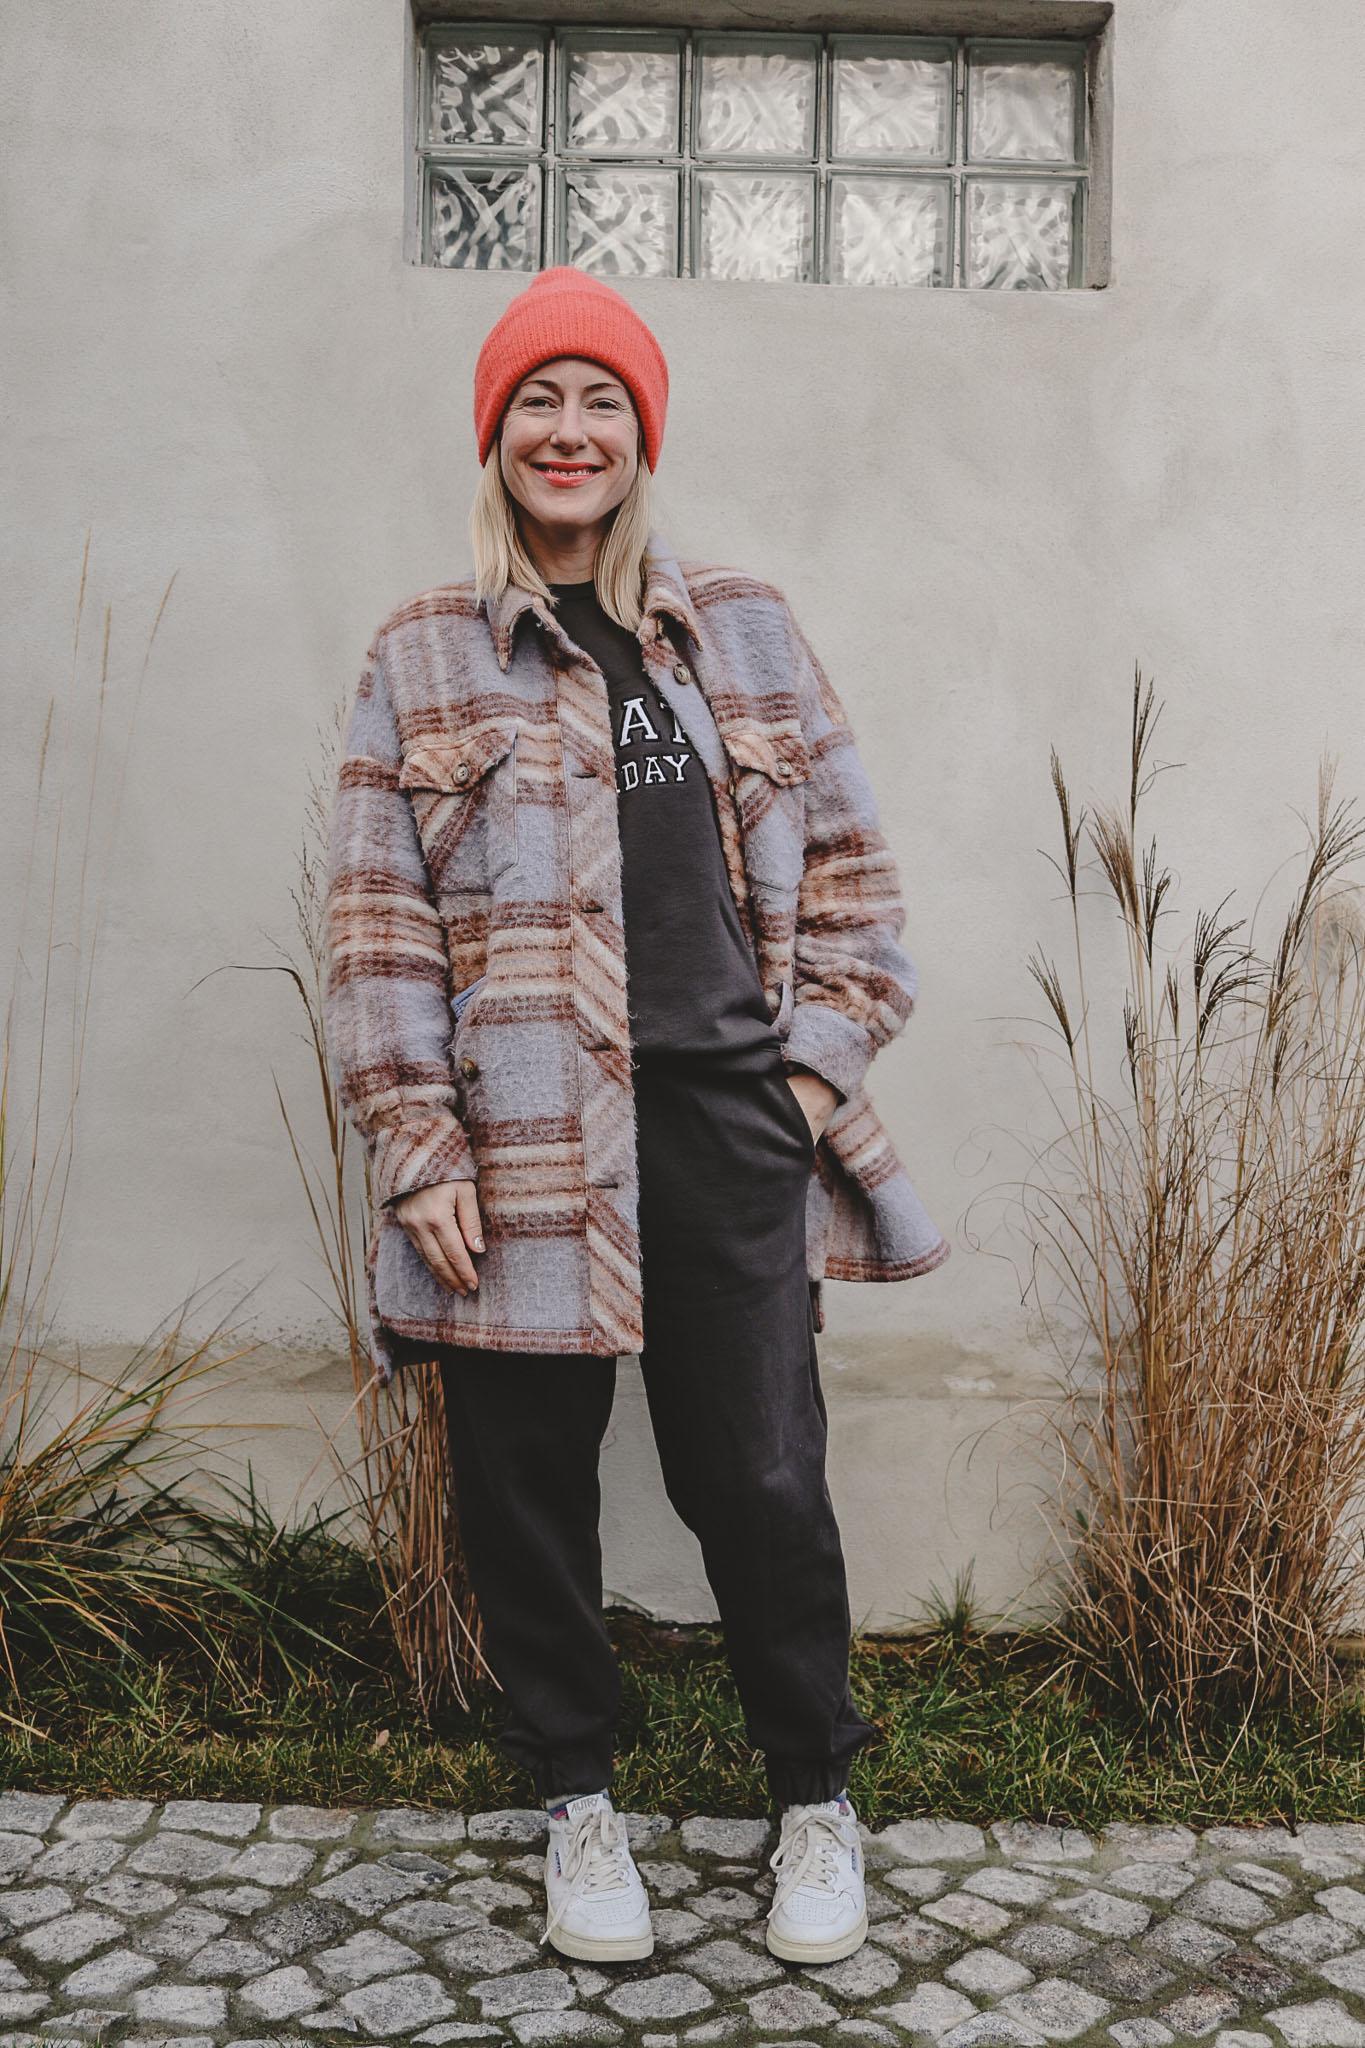 Lockdown-Uniform: Jogginganzug trifft Holzfällerjacke